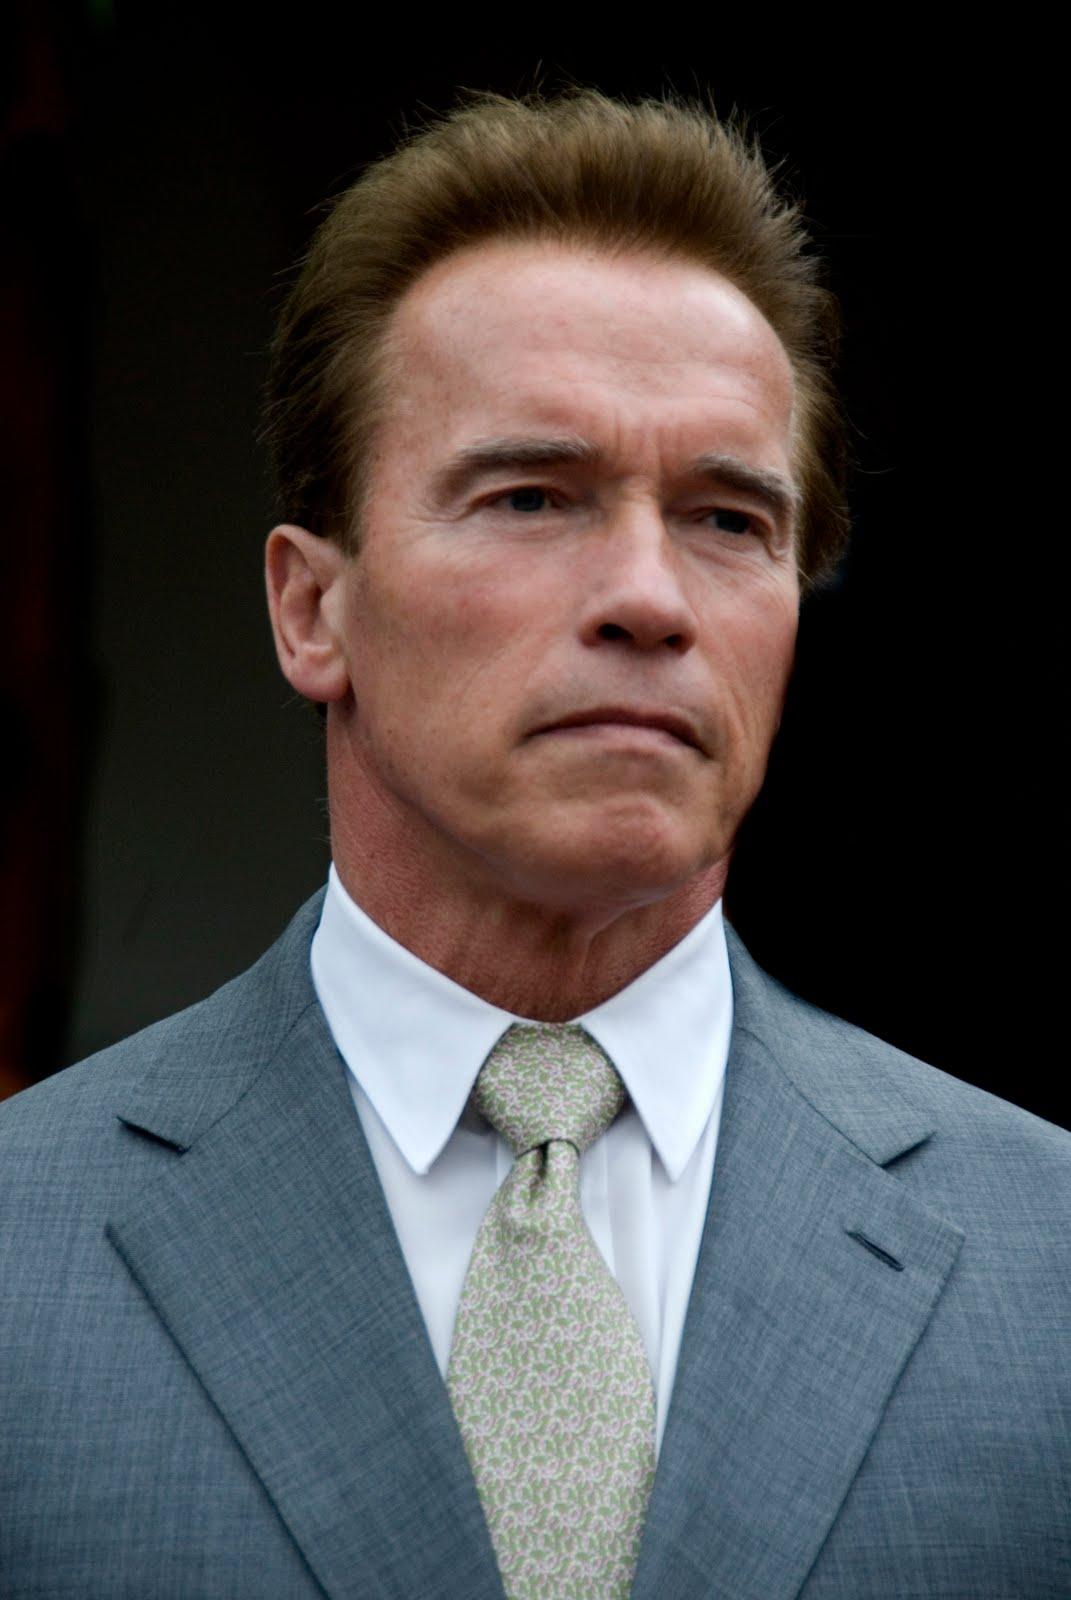 http://4.bp.blogspot.com/-sRMPw7Y7Ras/UPe6uz6QRCI/AAAAAAAAAmg/nk1KX2pVw-c/s1600/Arnold+Schwarzenegger+portrait.jpg